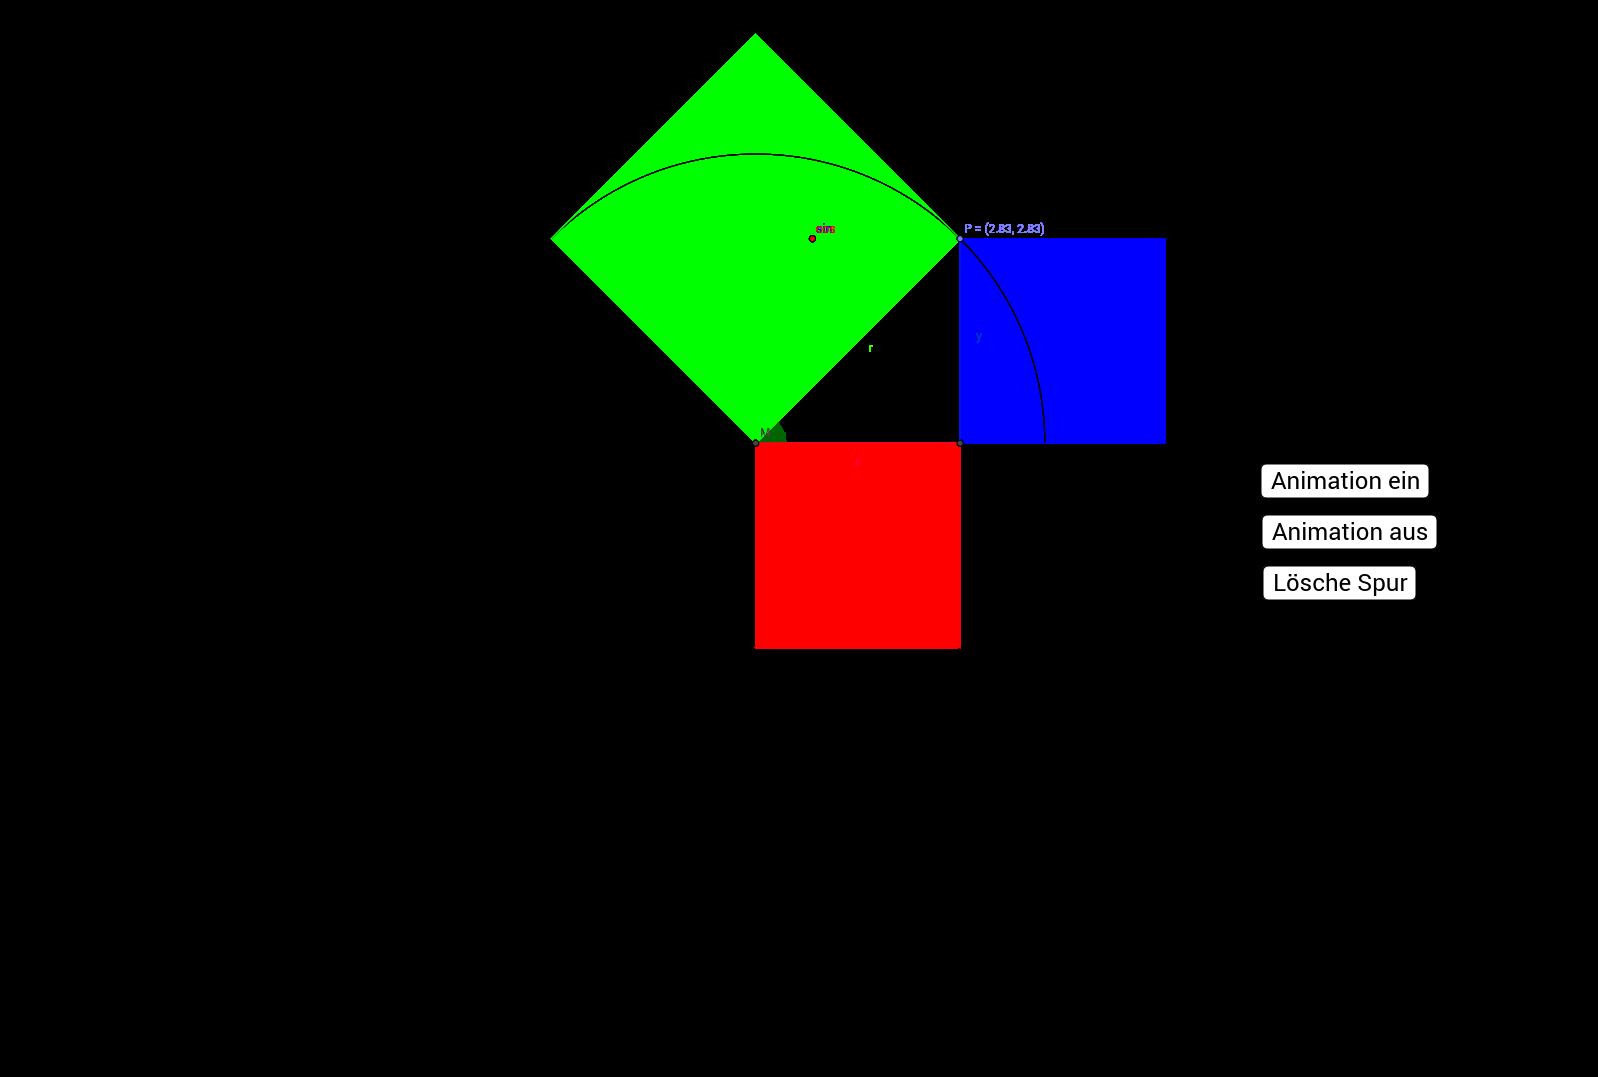 Die Kreisgleichung in Ursprungslage